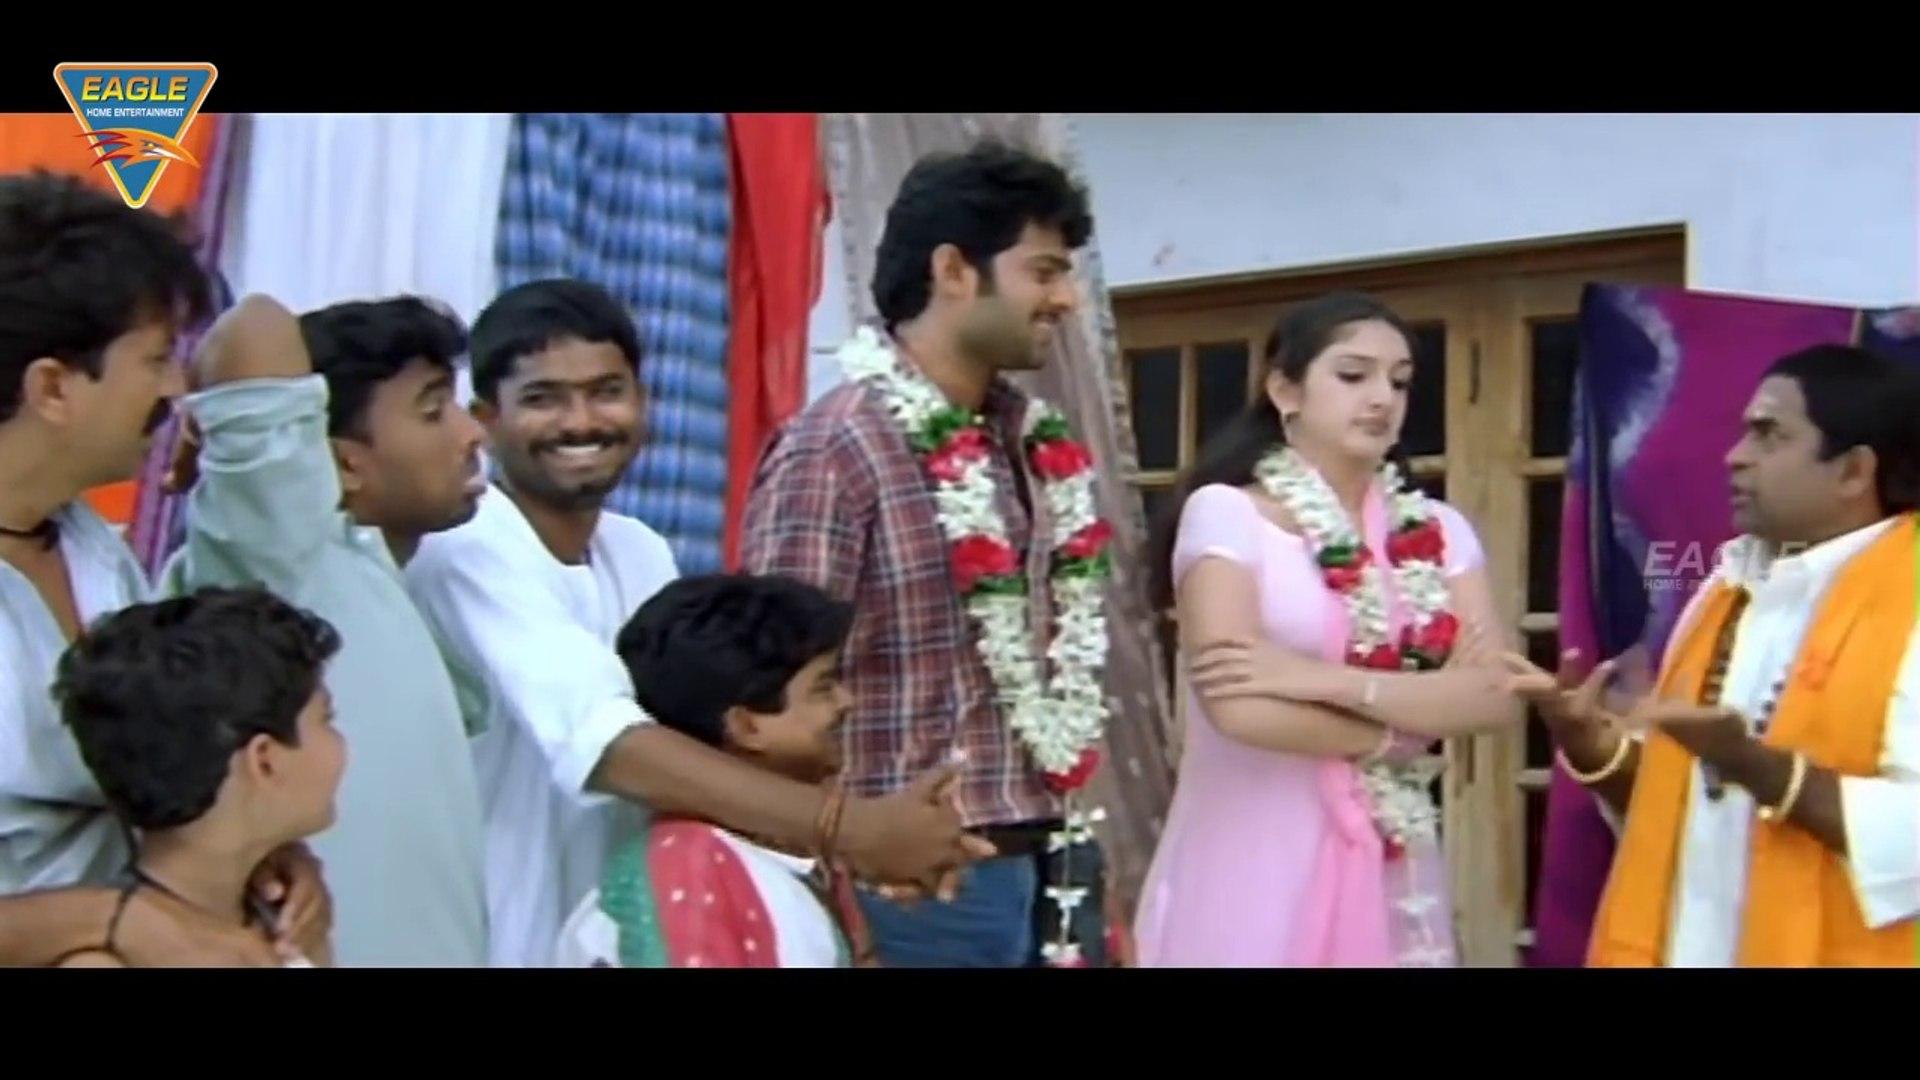 || Humla The War (Eeshwar 2017) South Indian Hindi Dubbed Full Movie Part 3/3 || Prabhas Hindi Dubbe